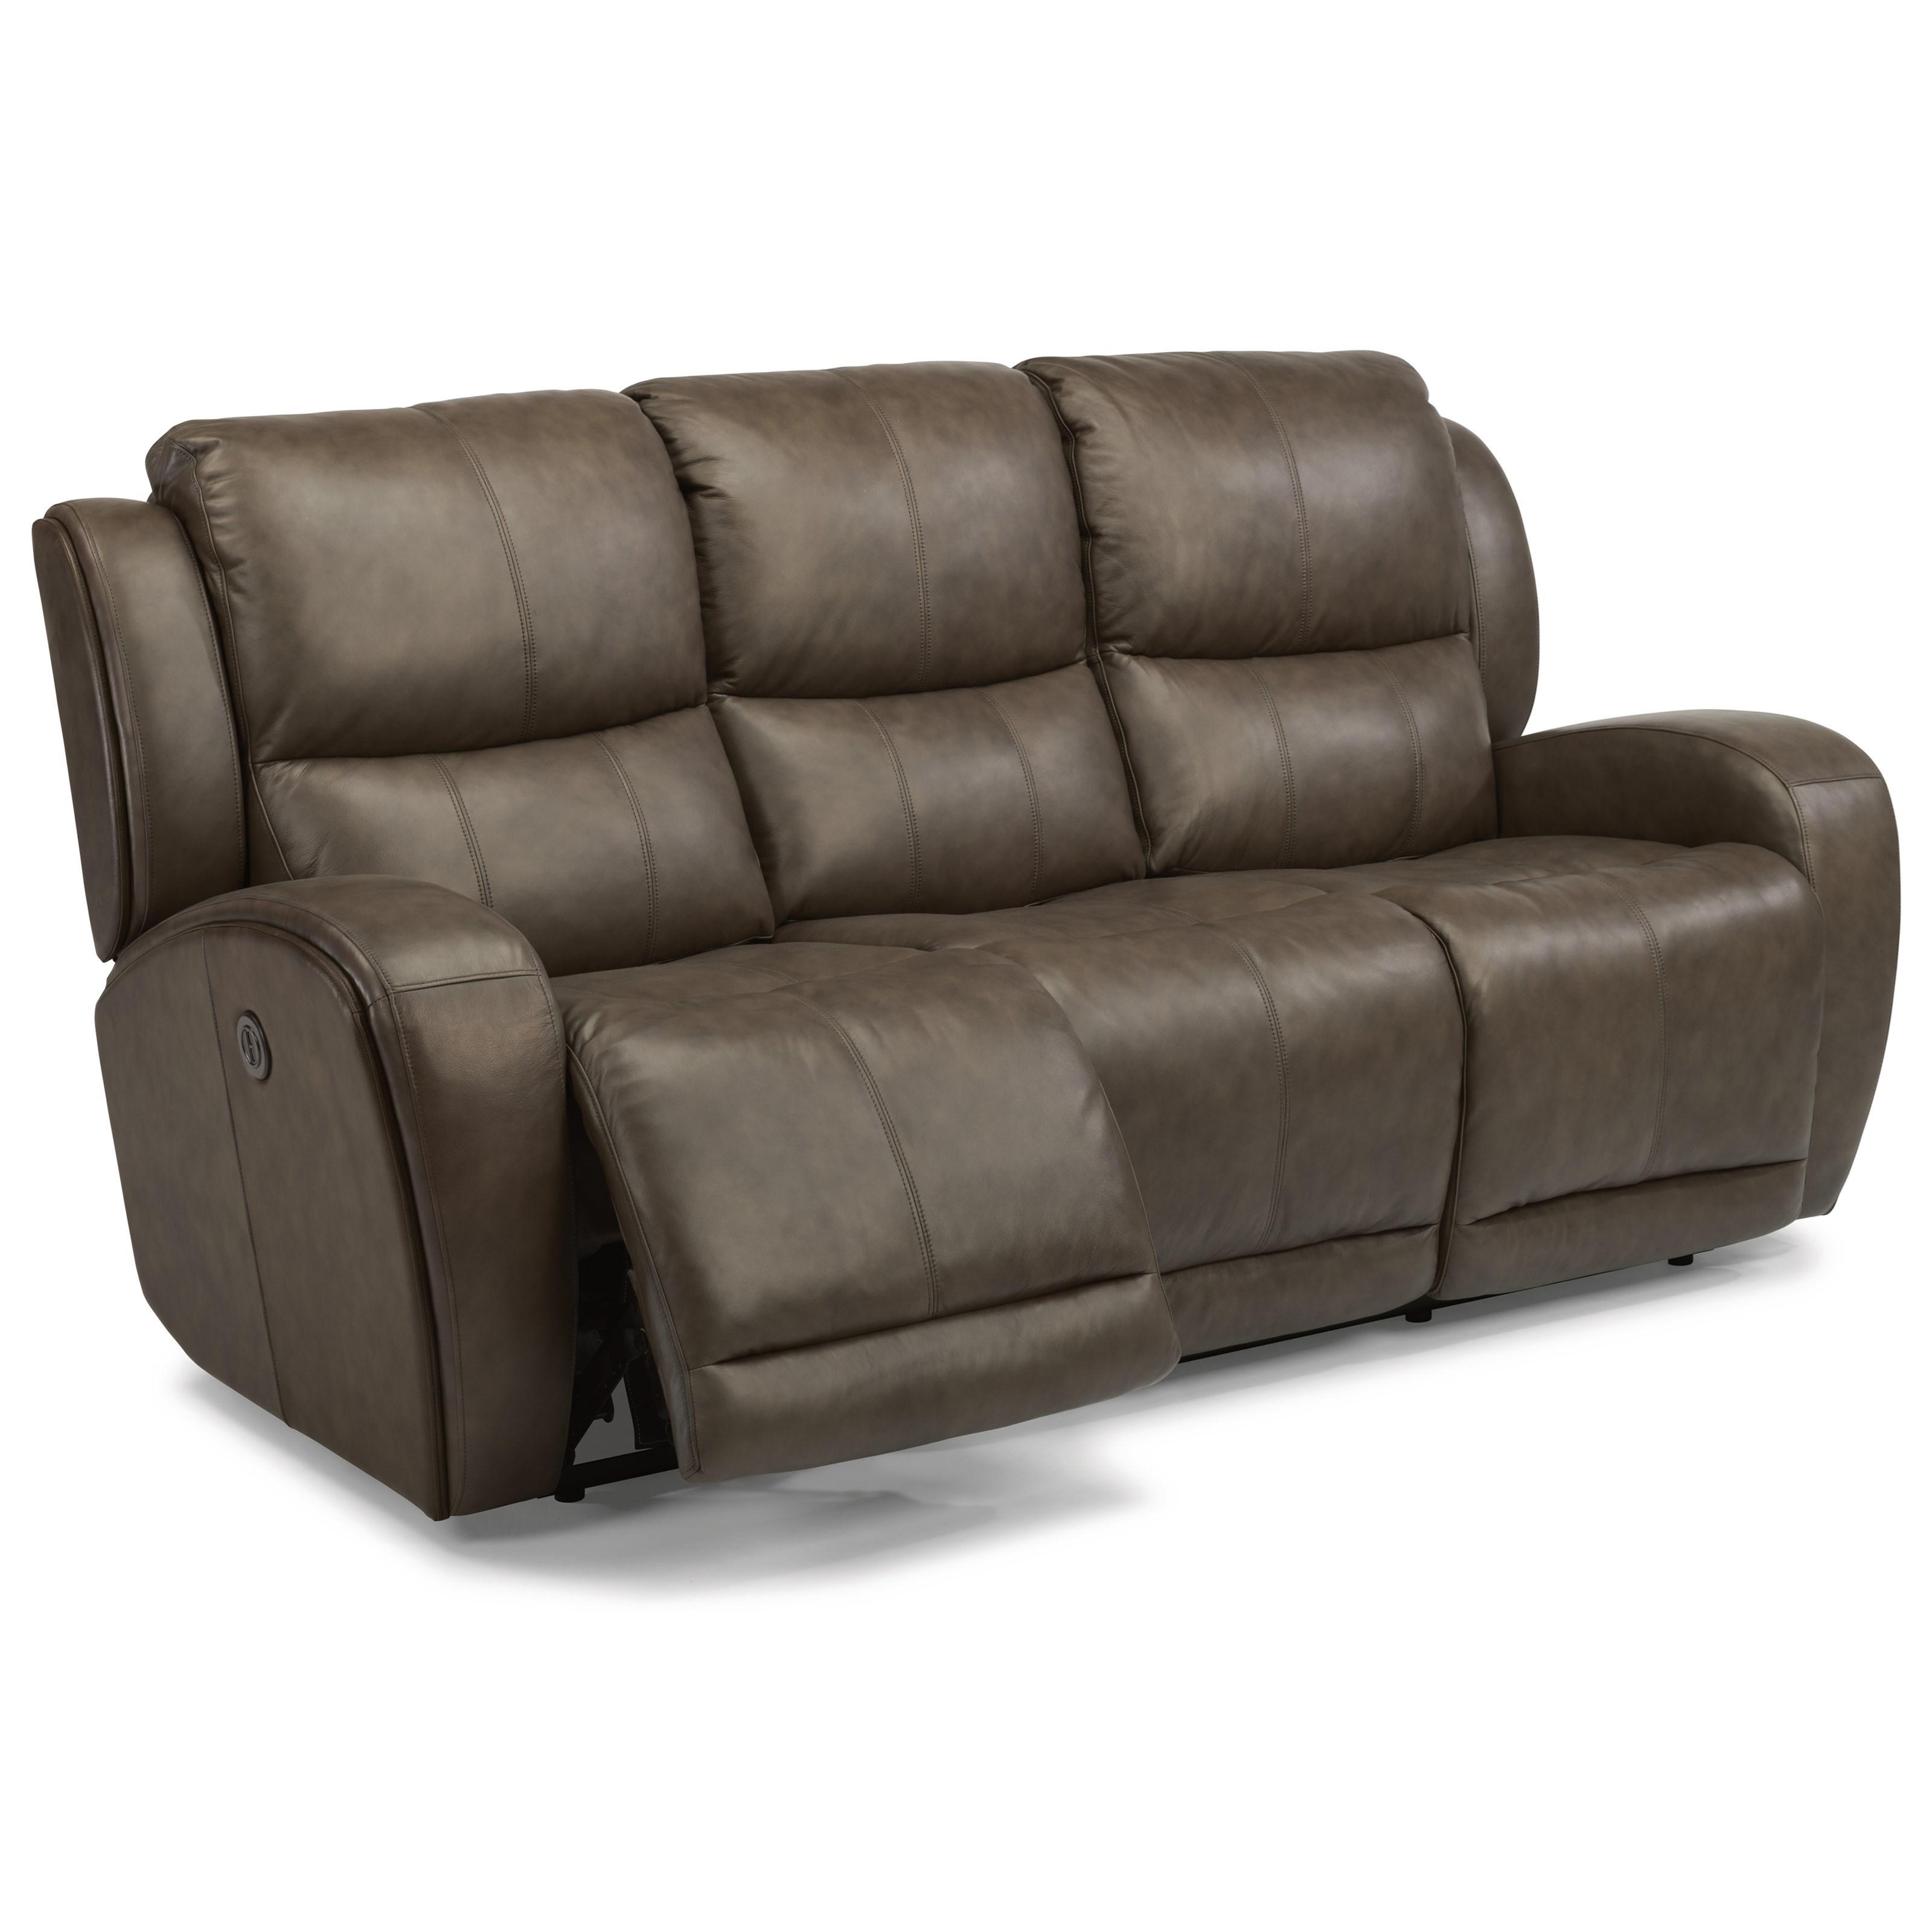 Flexsteel Chaz Contemporary Power Reclining Sofa With USB Ports